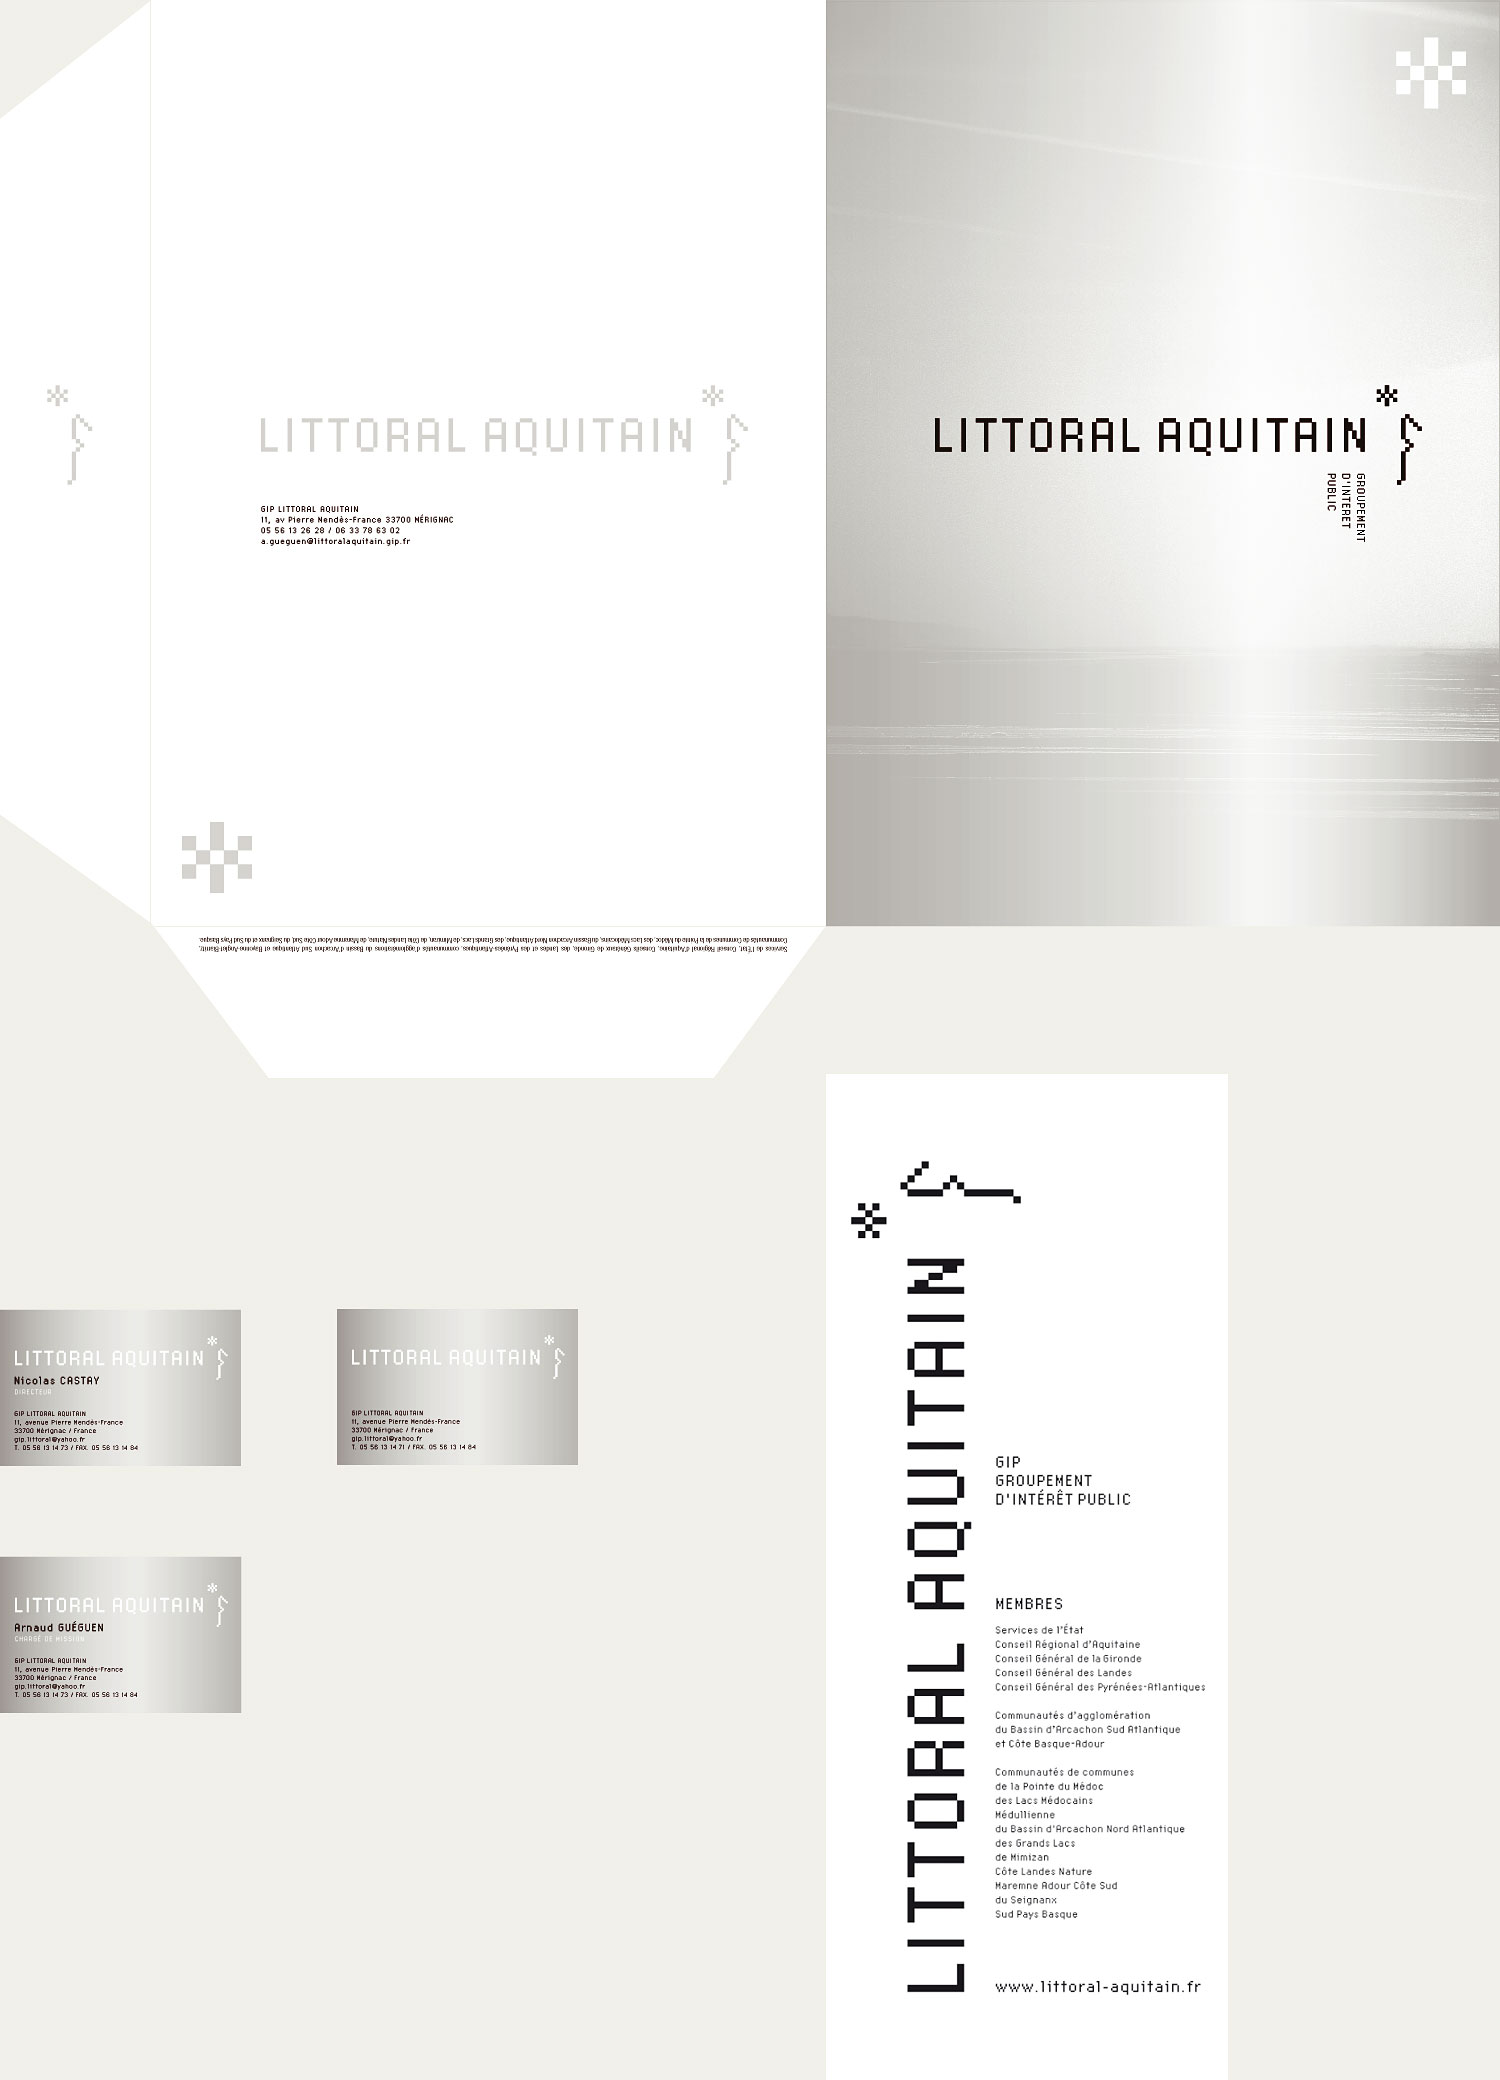 MrThornill-graphisme-gip-littoral-aquitain-identite-visuelle-ph1